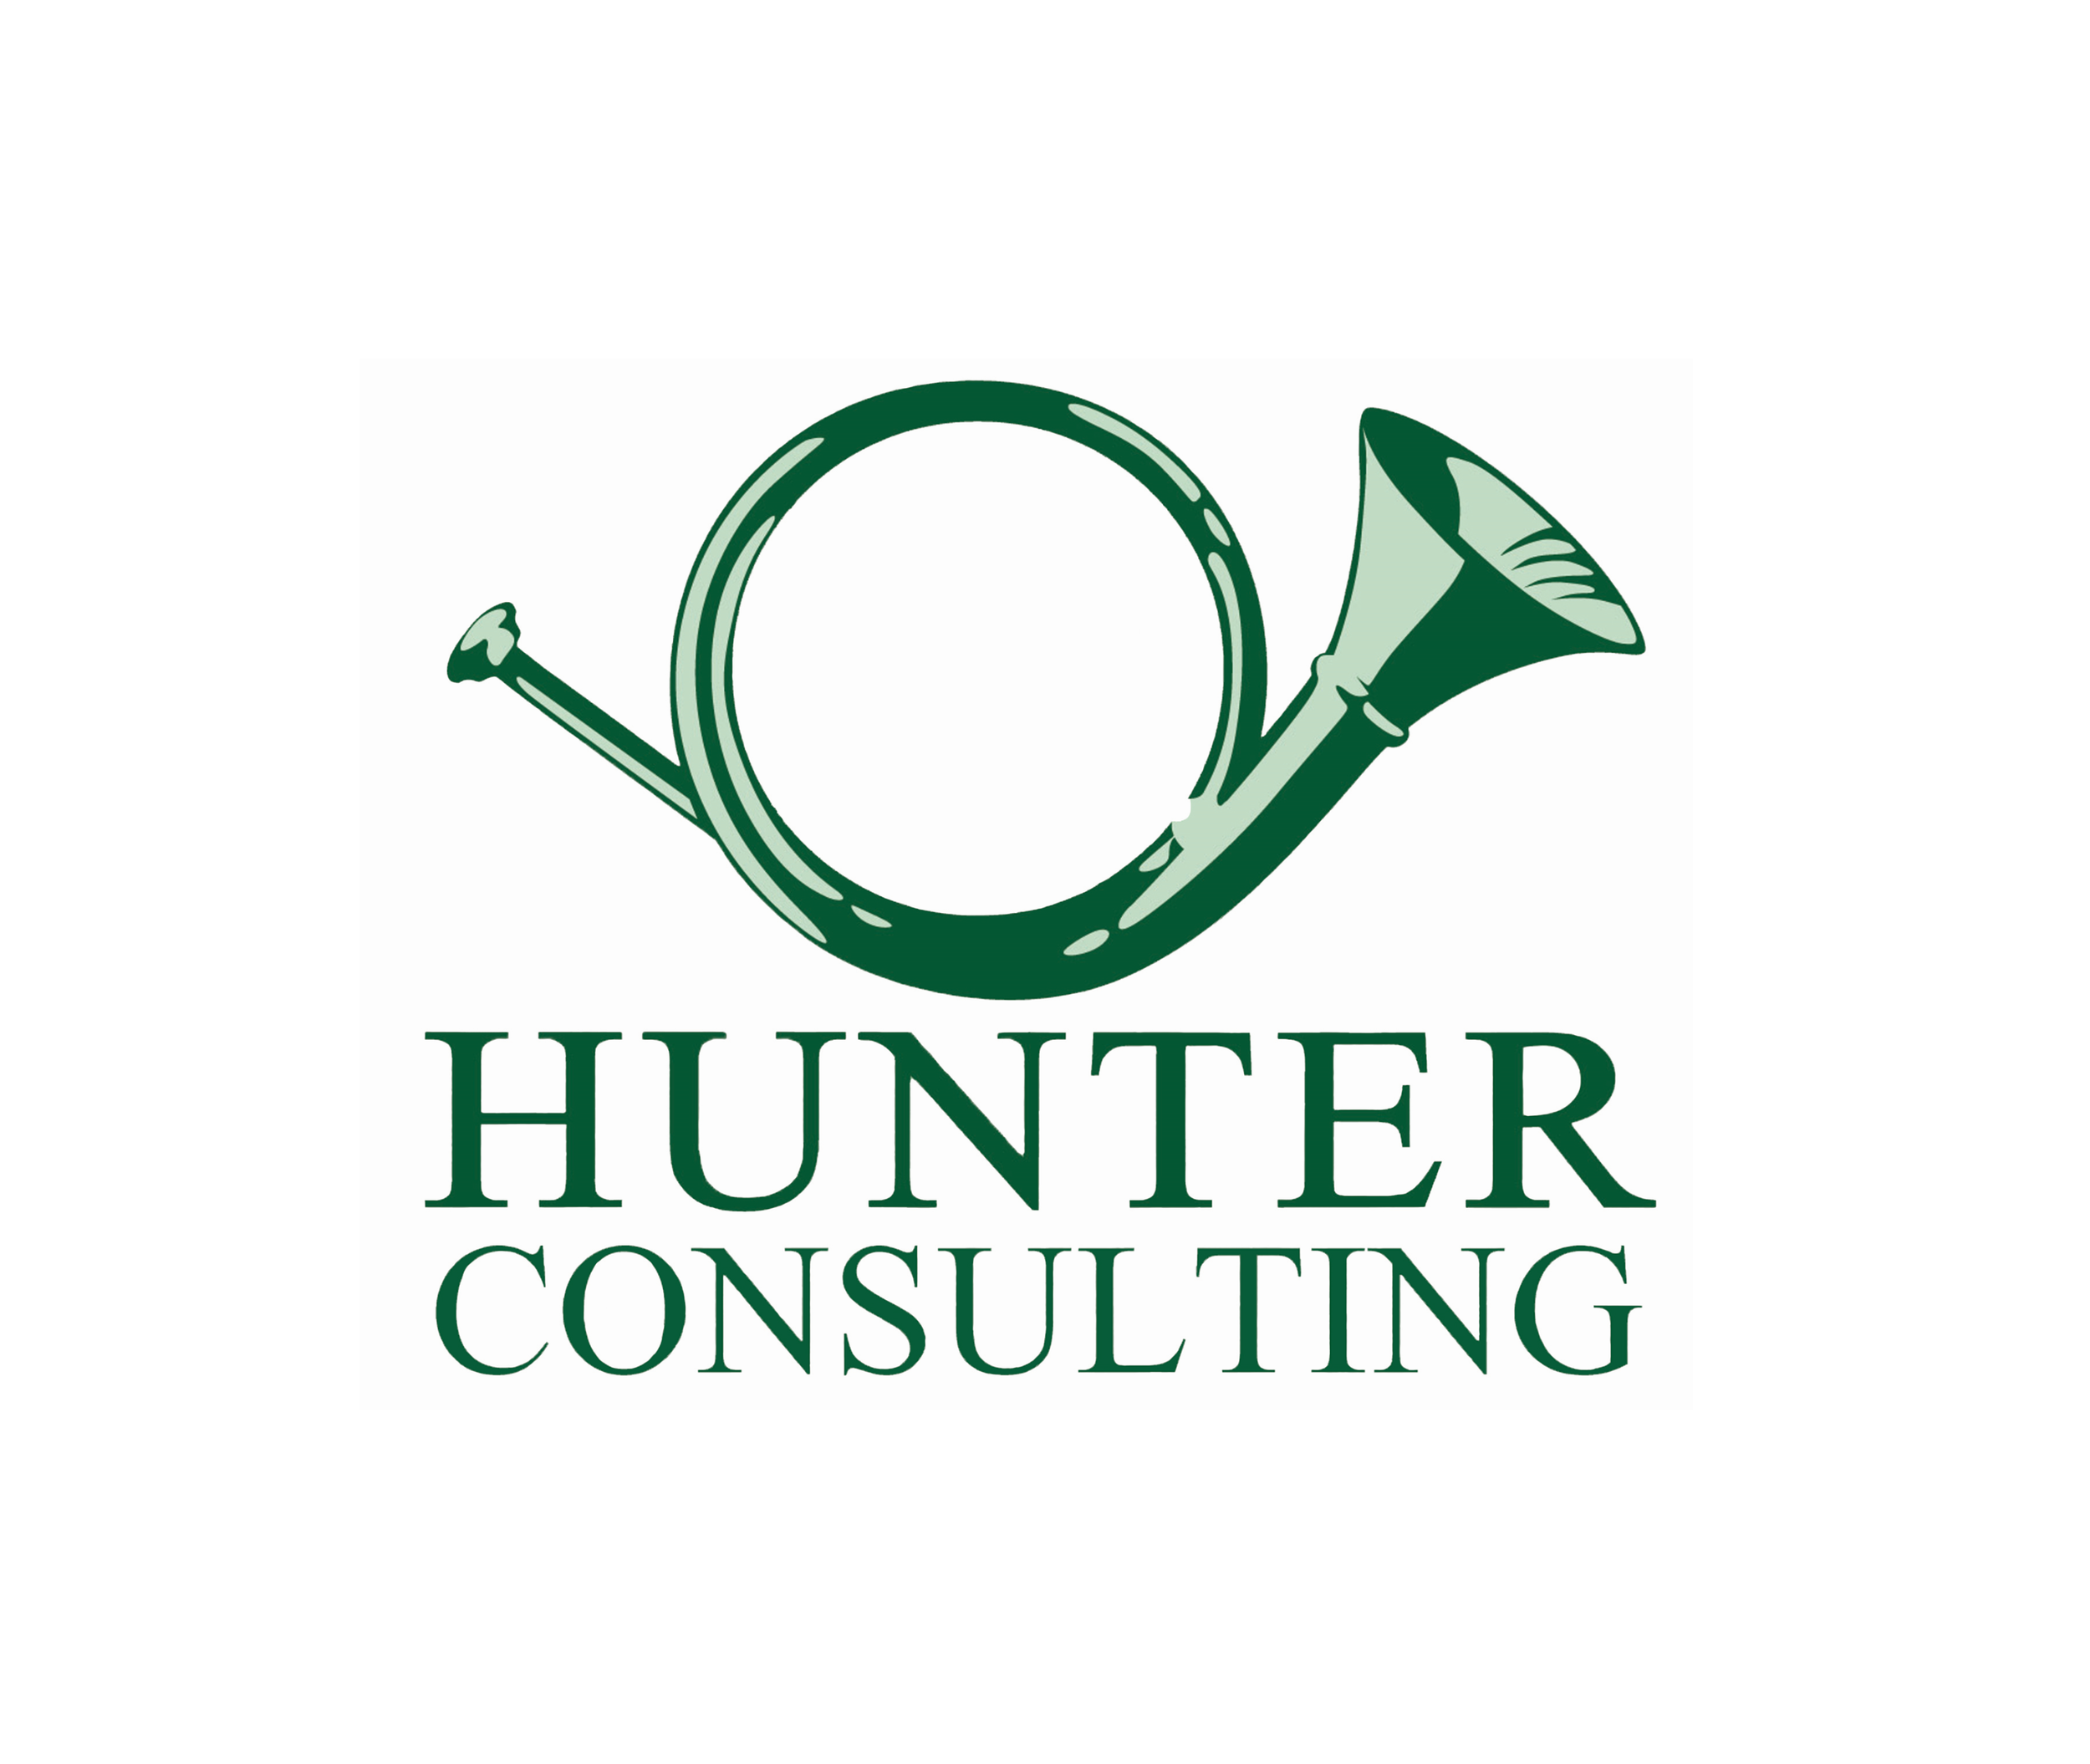 Hunter Consulting.jpg